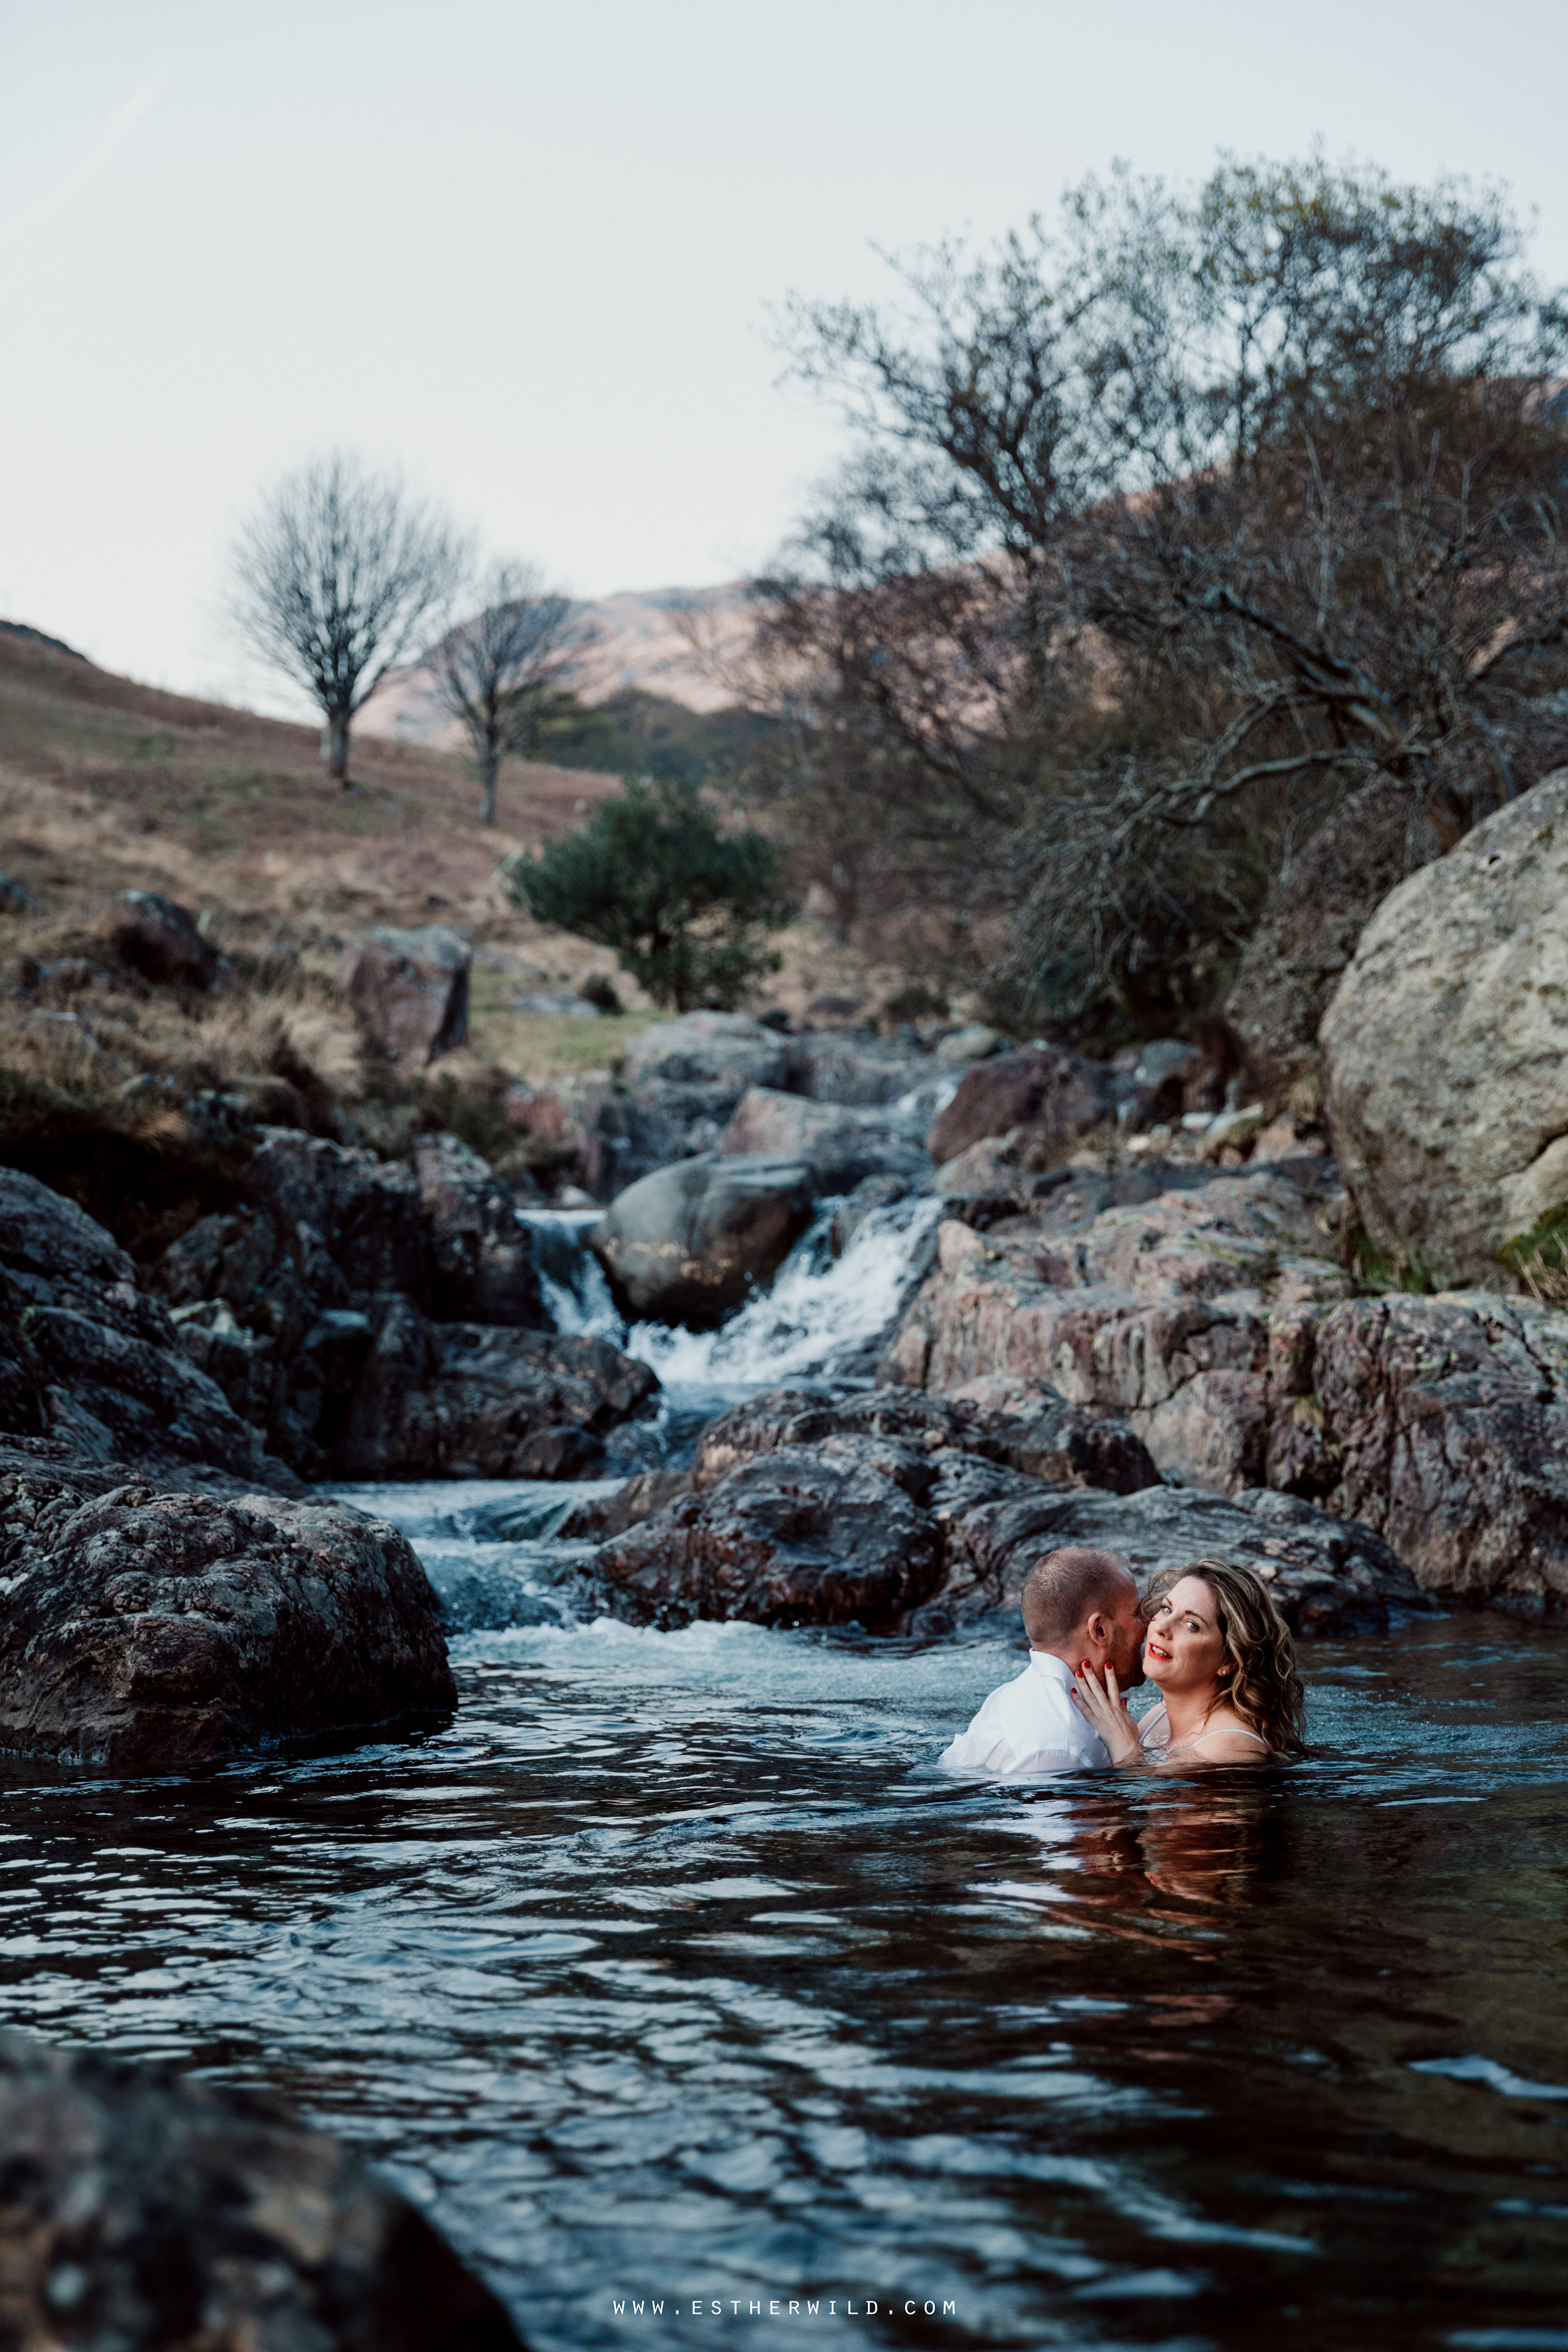 Cumbria_Lake_District_Wasdale_Wedding_Photographer_Destination_Engagement_Anniversary_Esther_Wild_IMG_4425.jpg